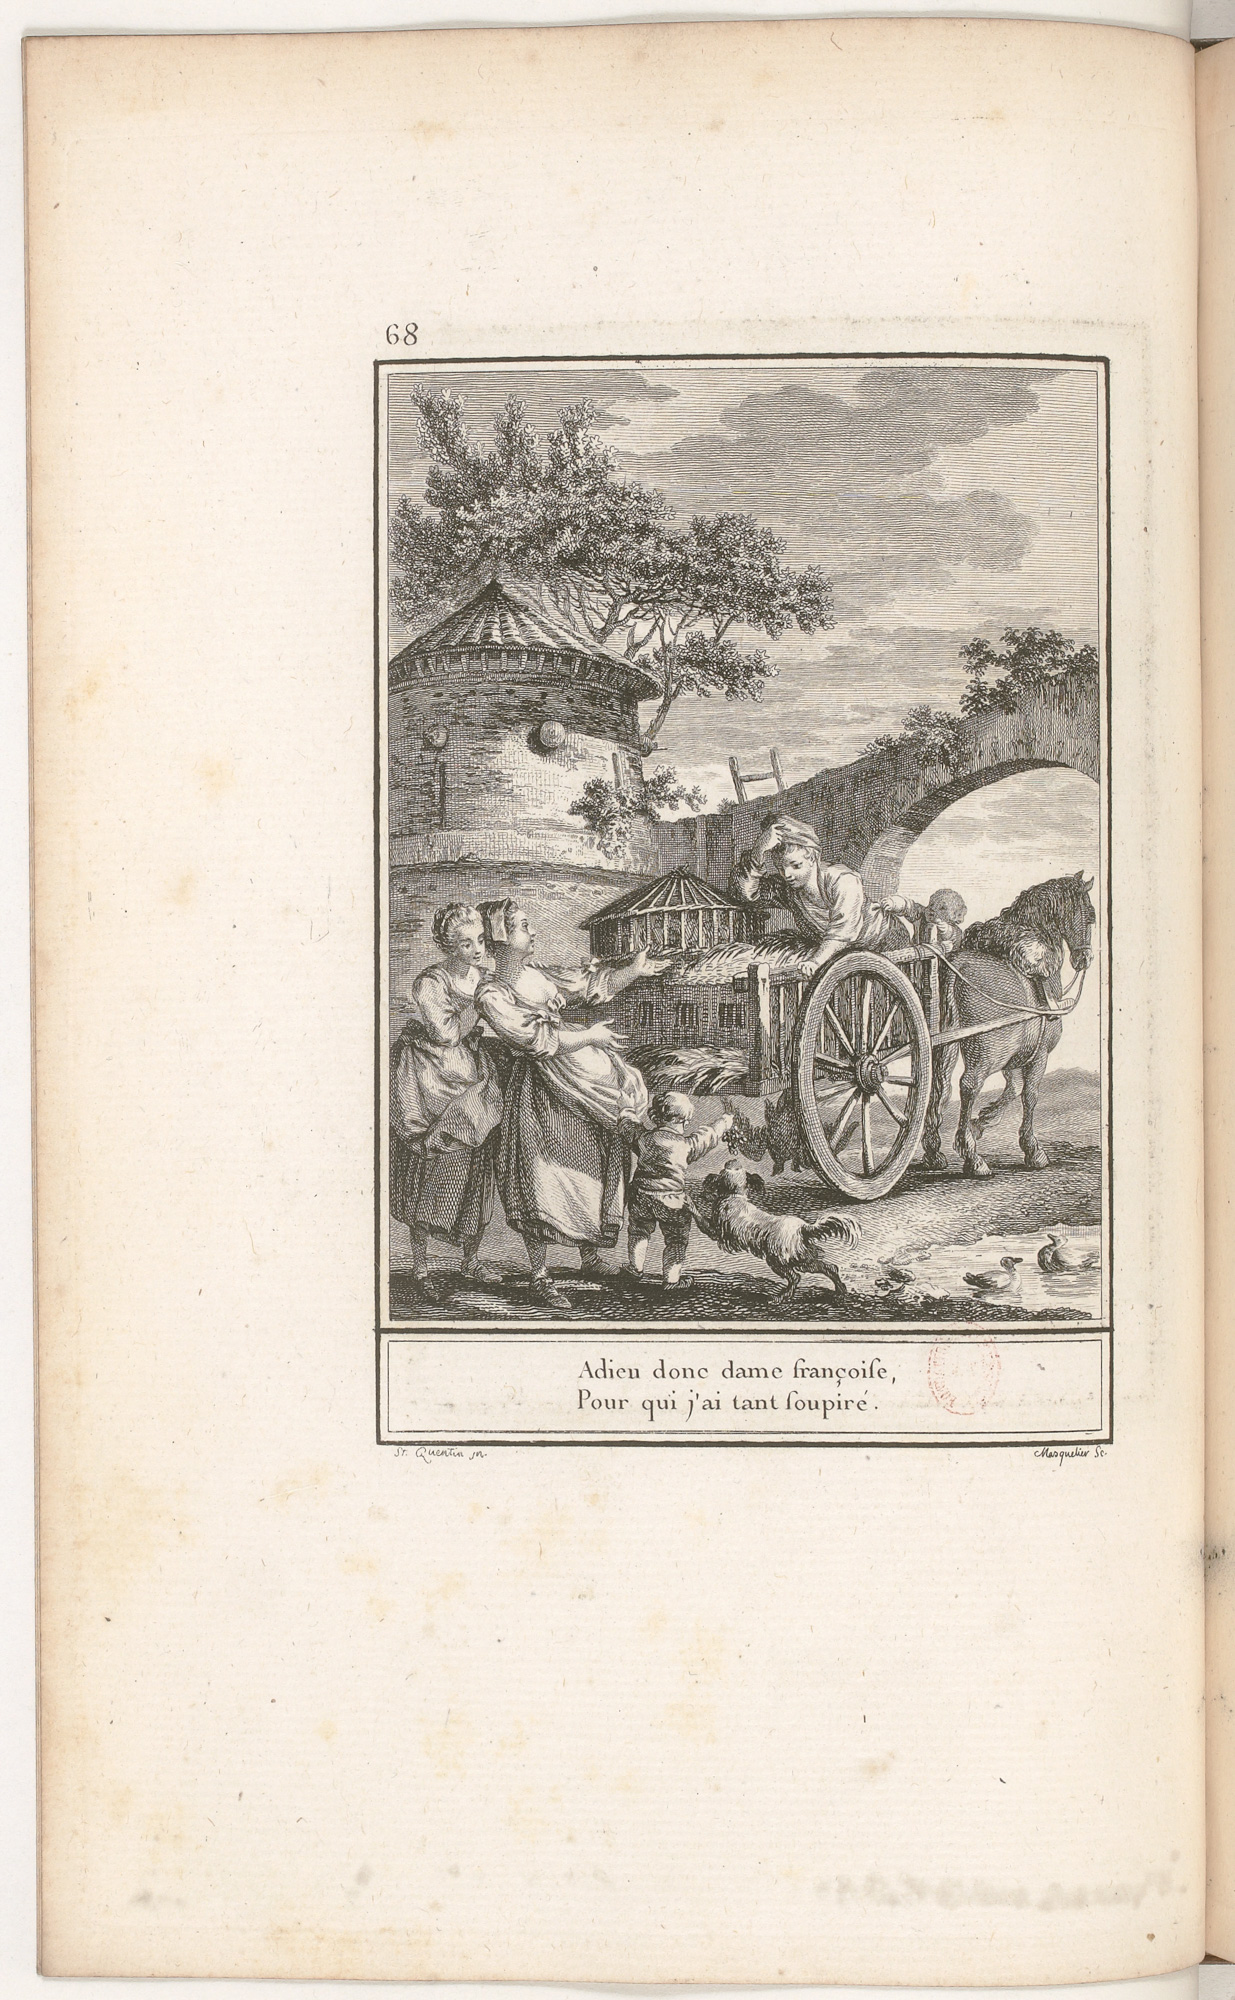 S.4.12 Dame françoise,1772, Image